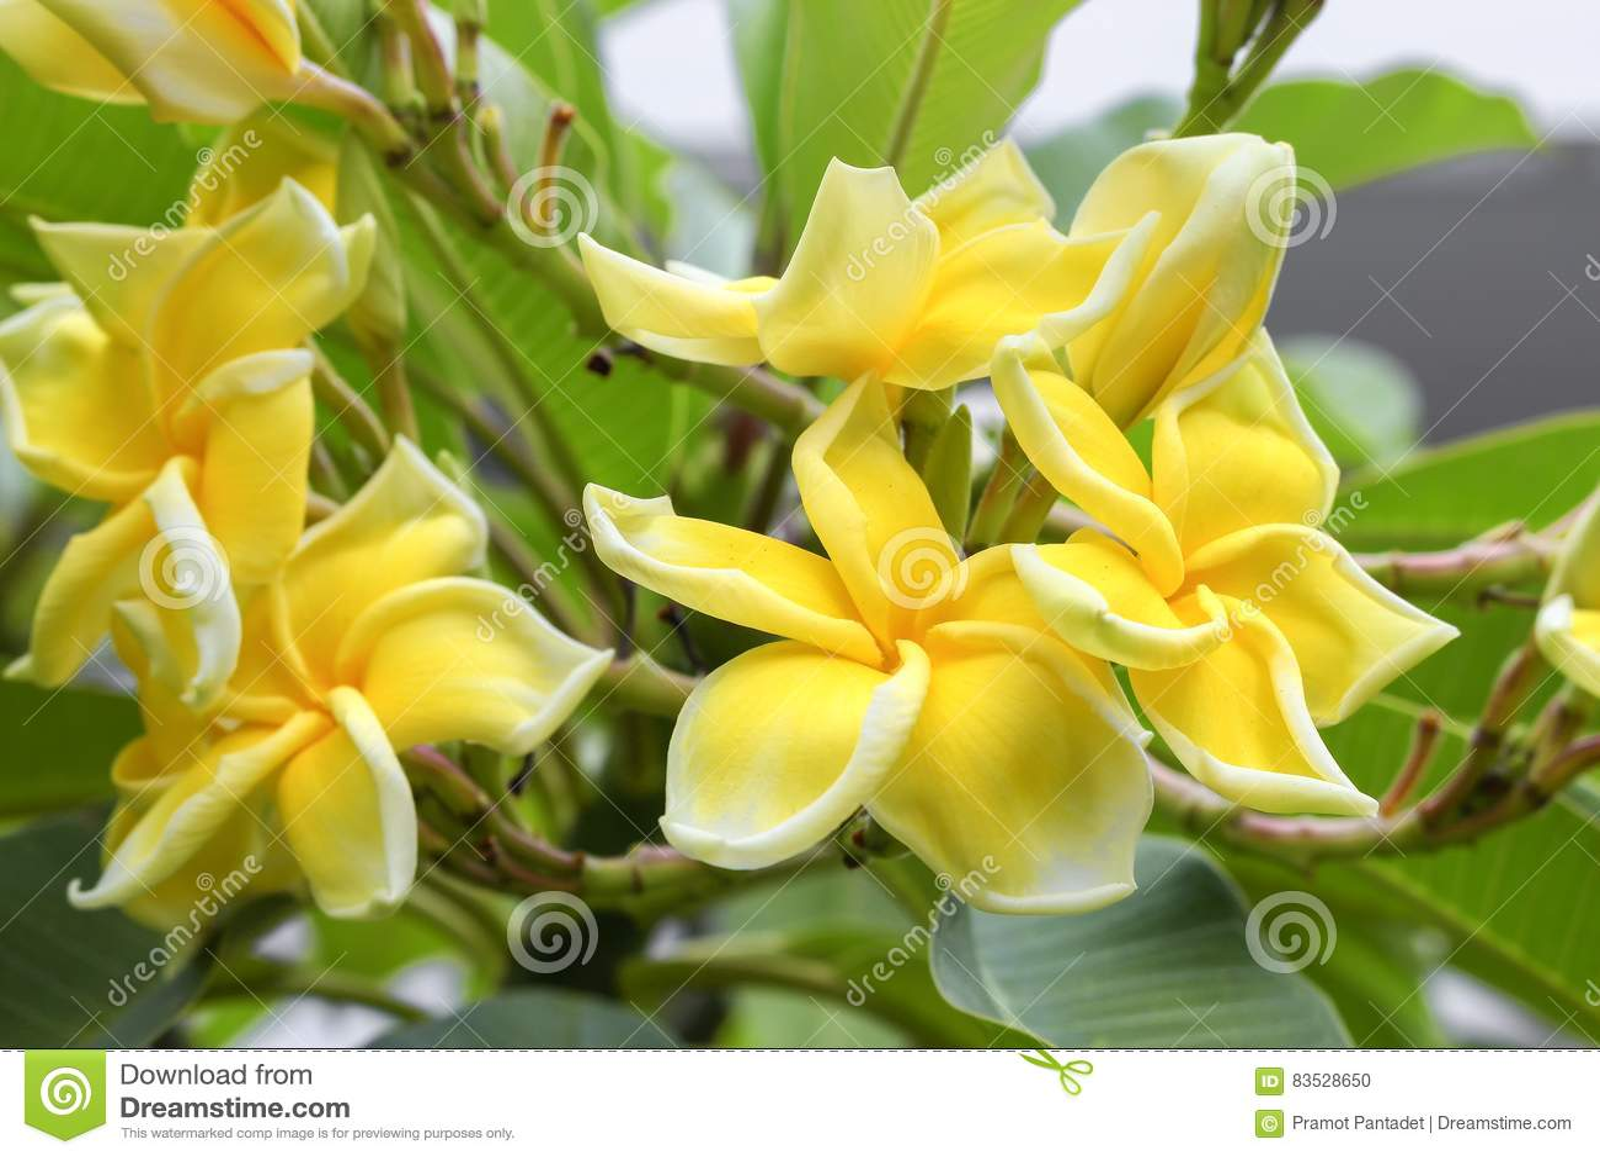 Plumeria Flower Yellow And Pink Frangipani Tropical Flower Stock